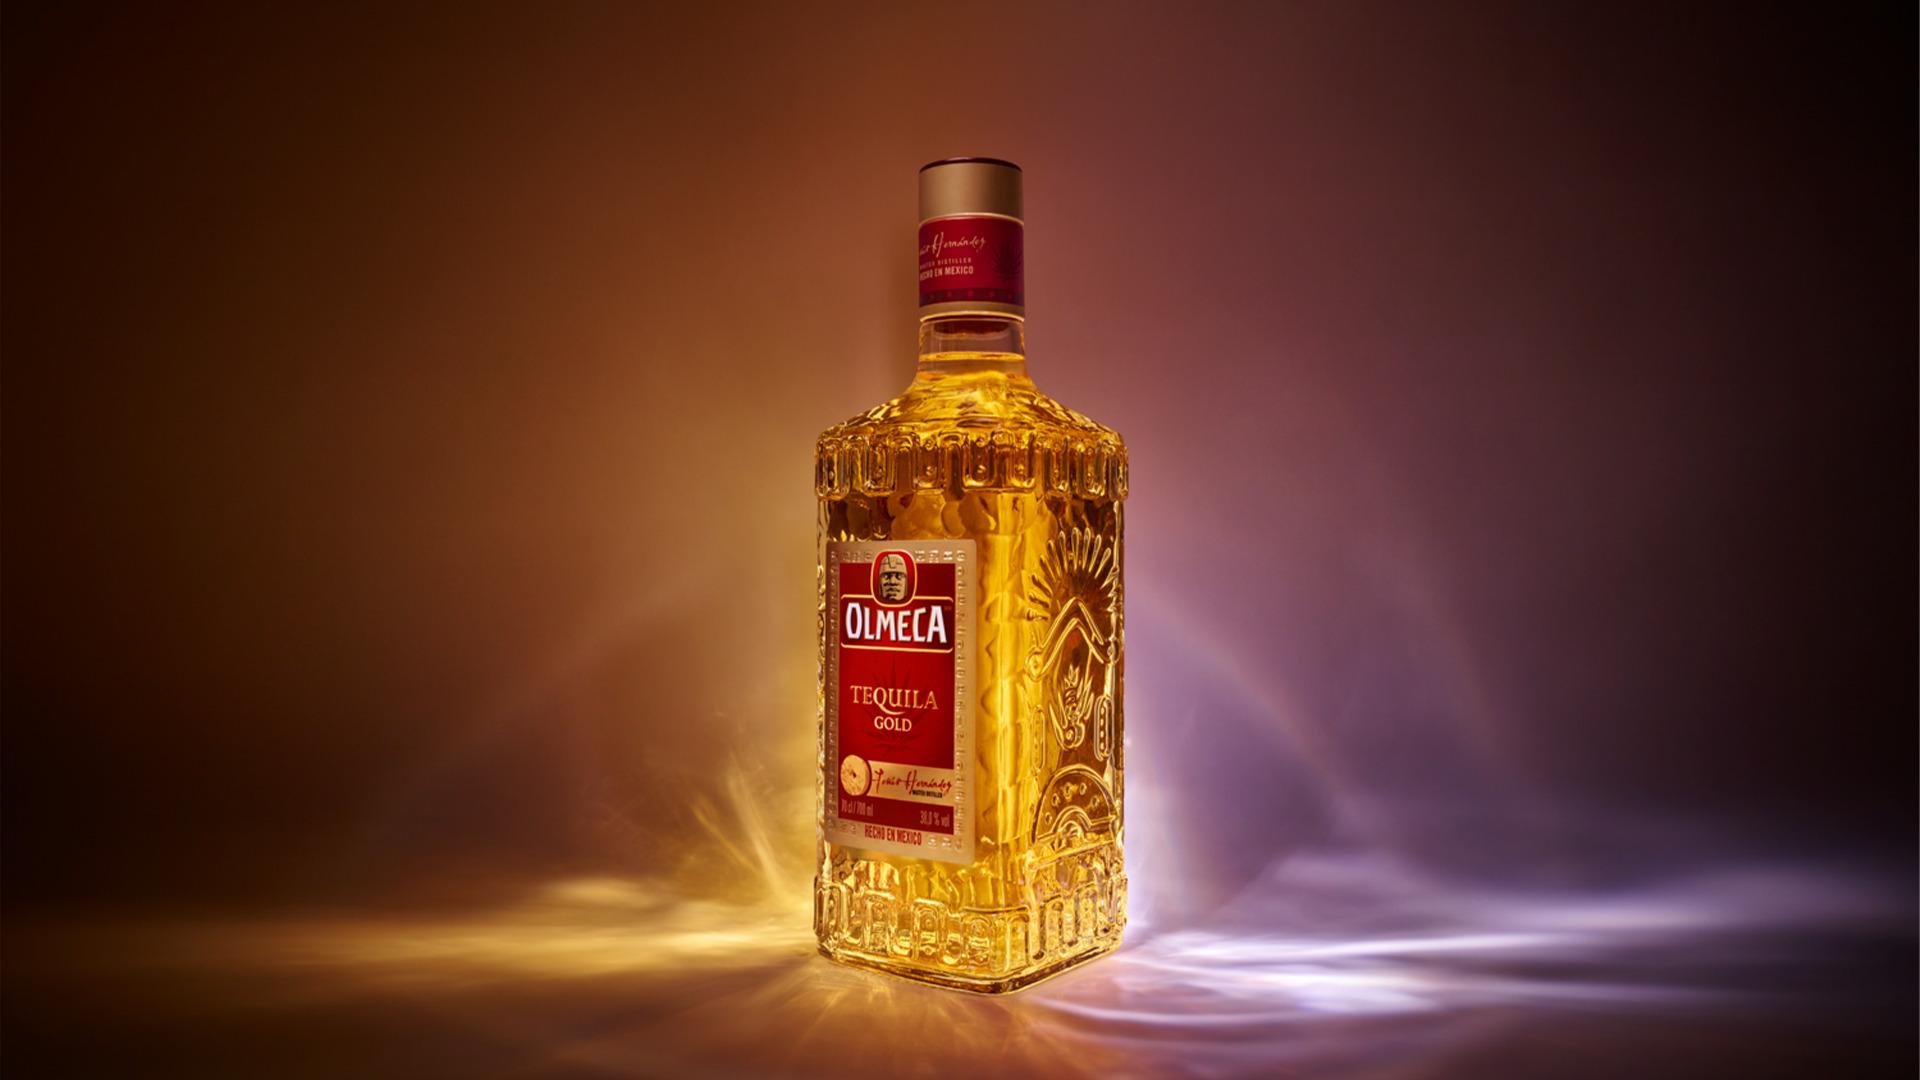 Rượu Tequila Olmeca